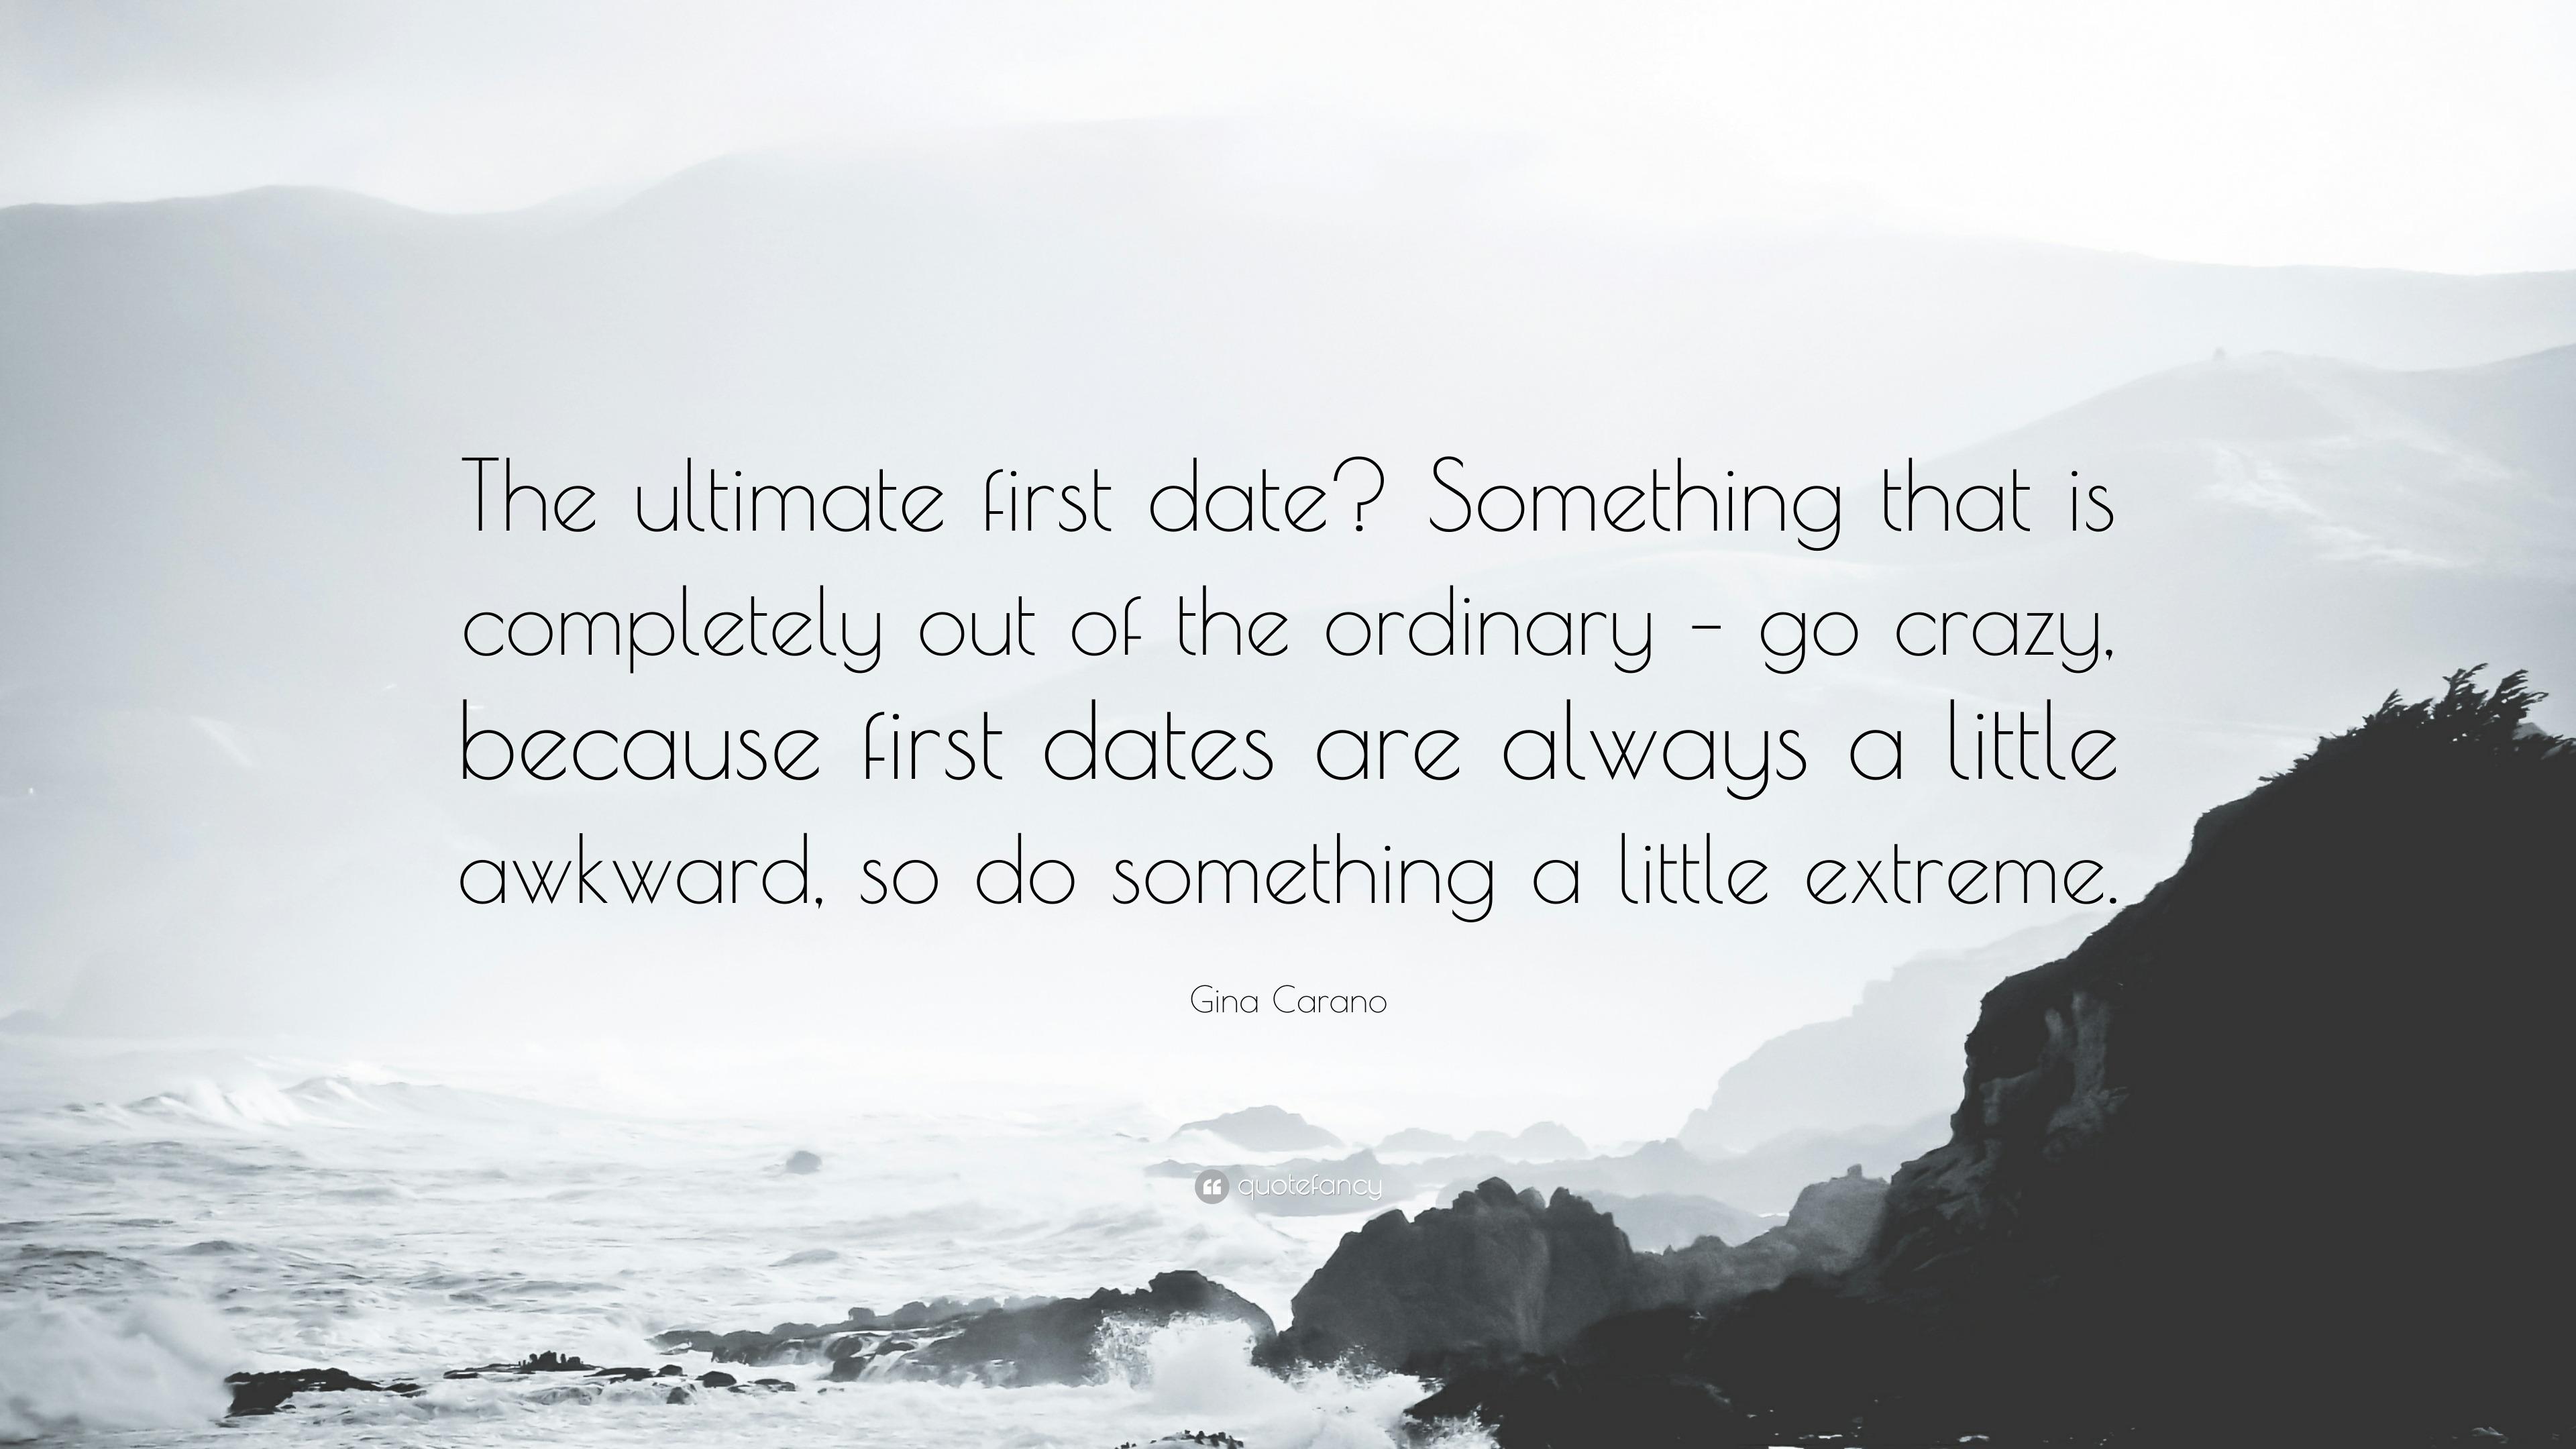 Encouragement for long distance relationships